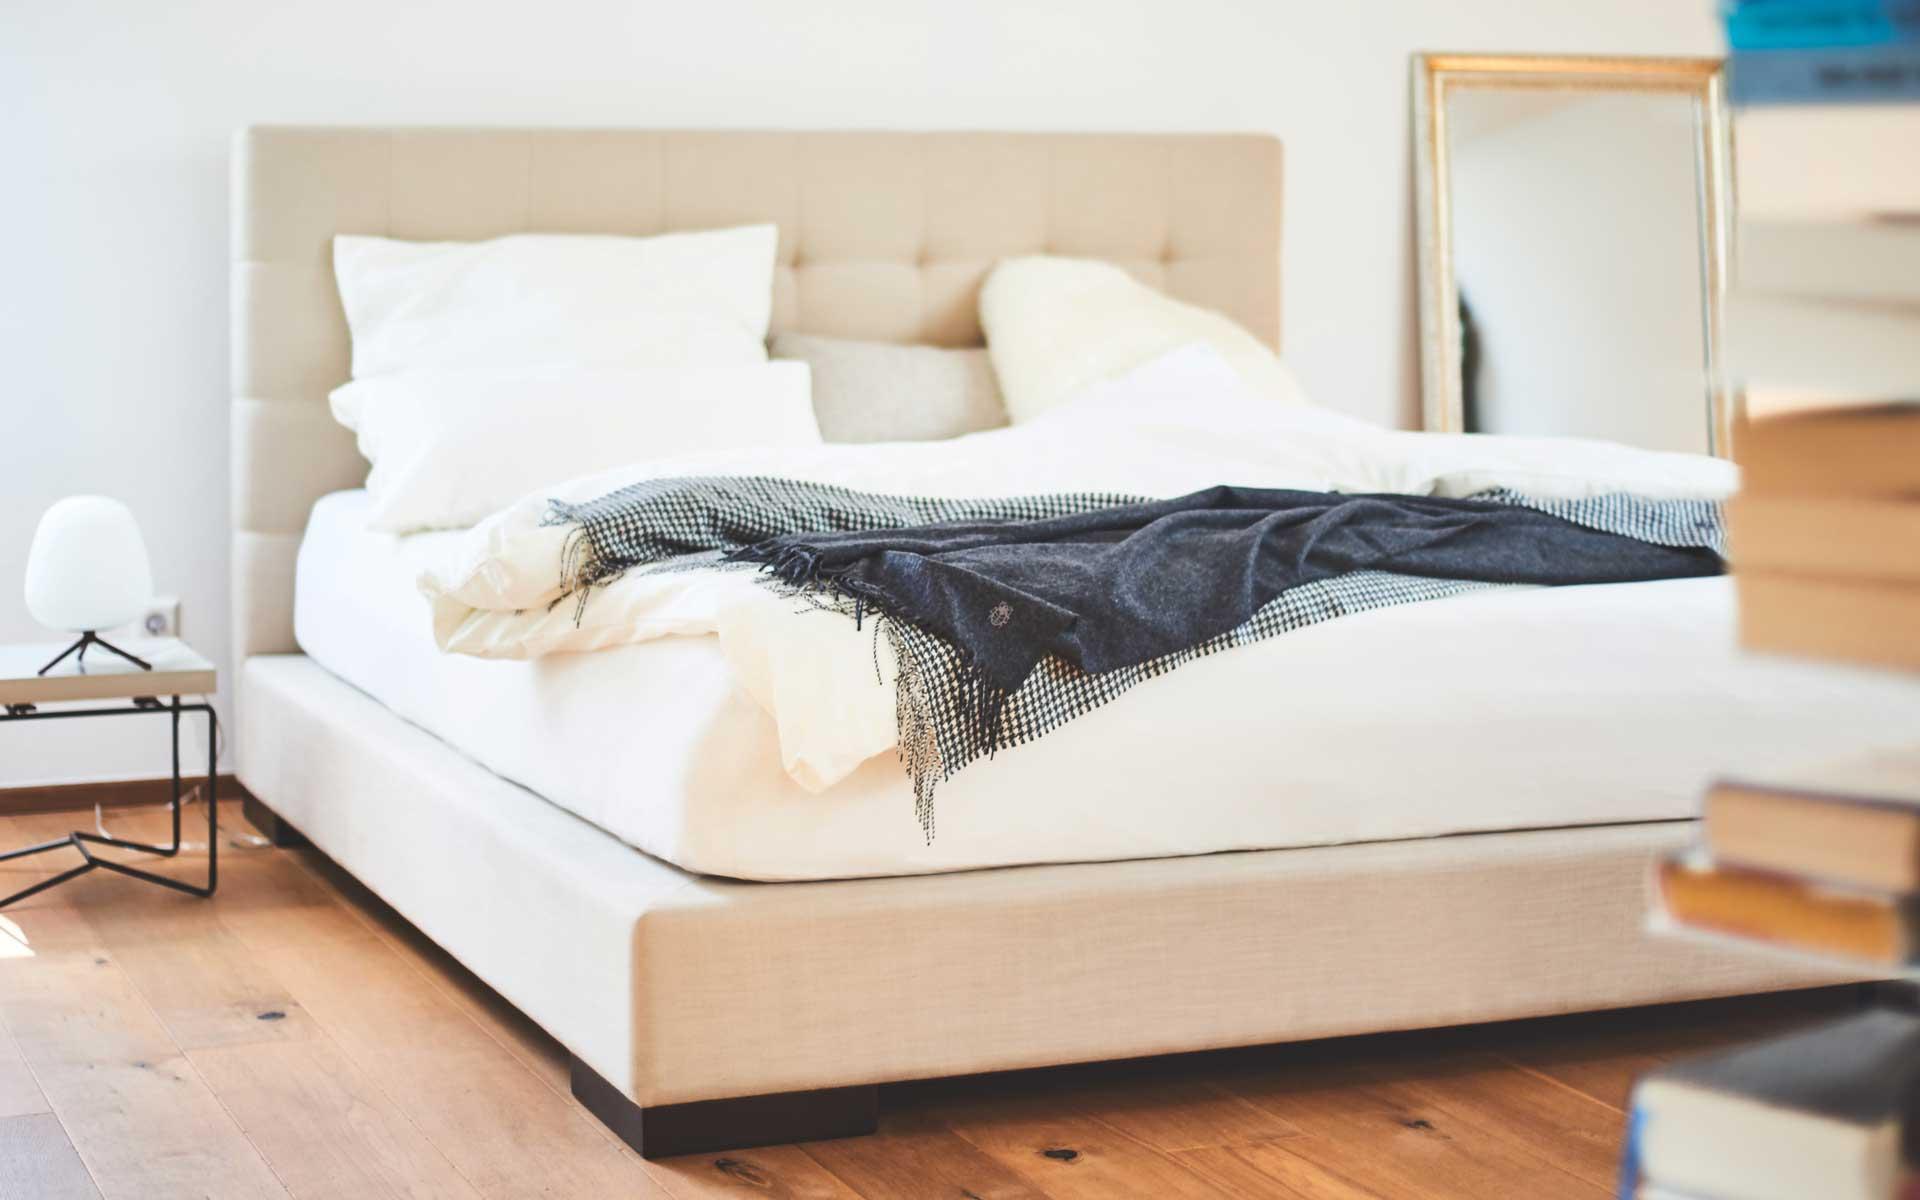 Full Size of Betten De Sophisticated Living Bett Betten.de